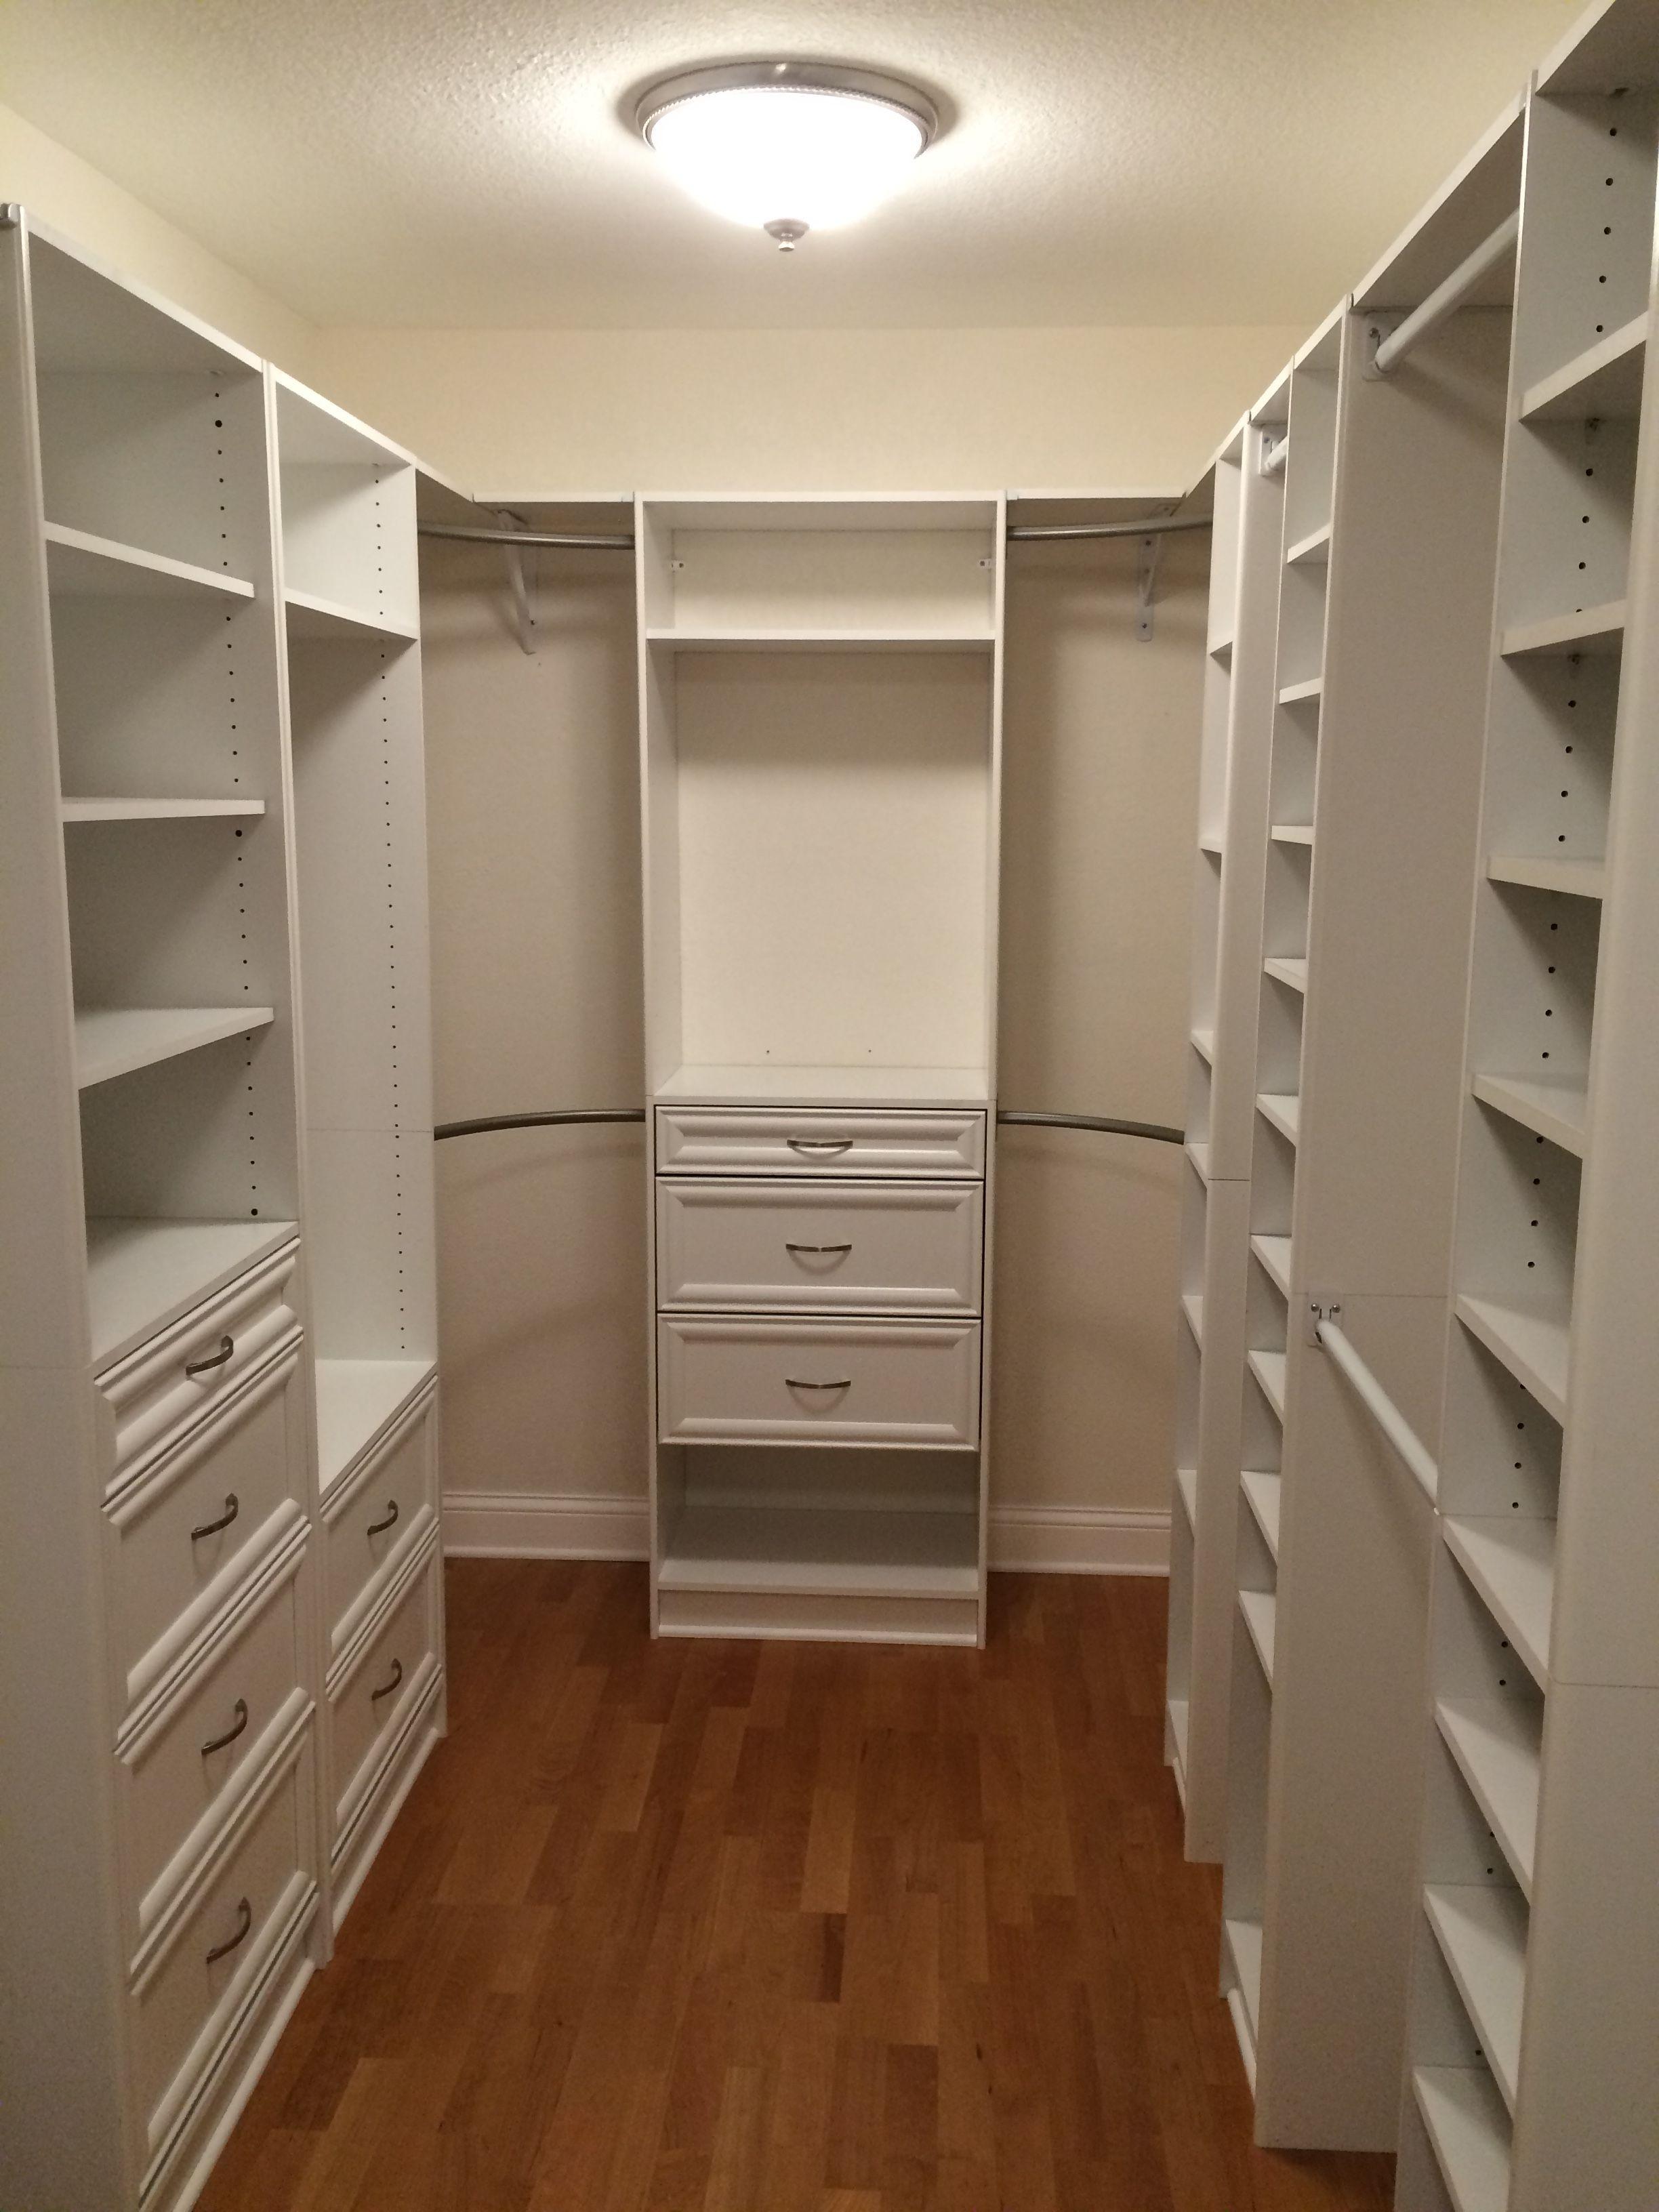 Master Closet In 2020 Closet Layout Small Master Closet Closet Remodel